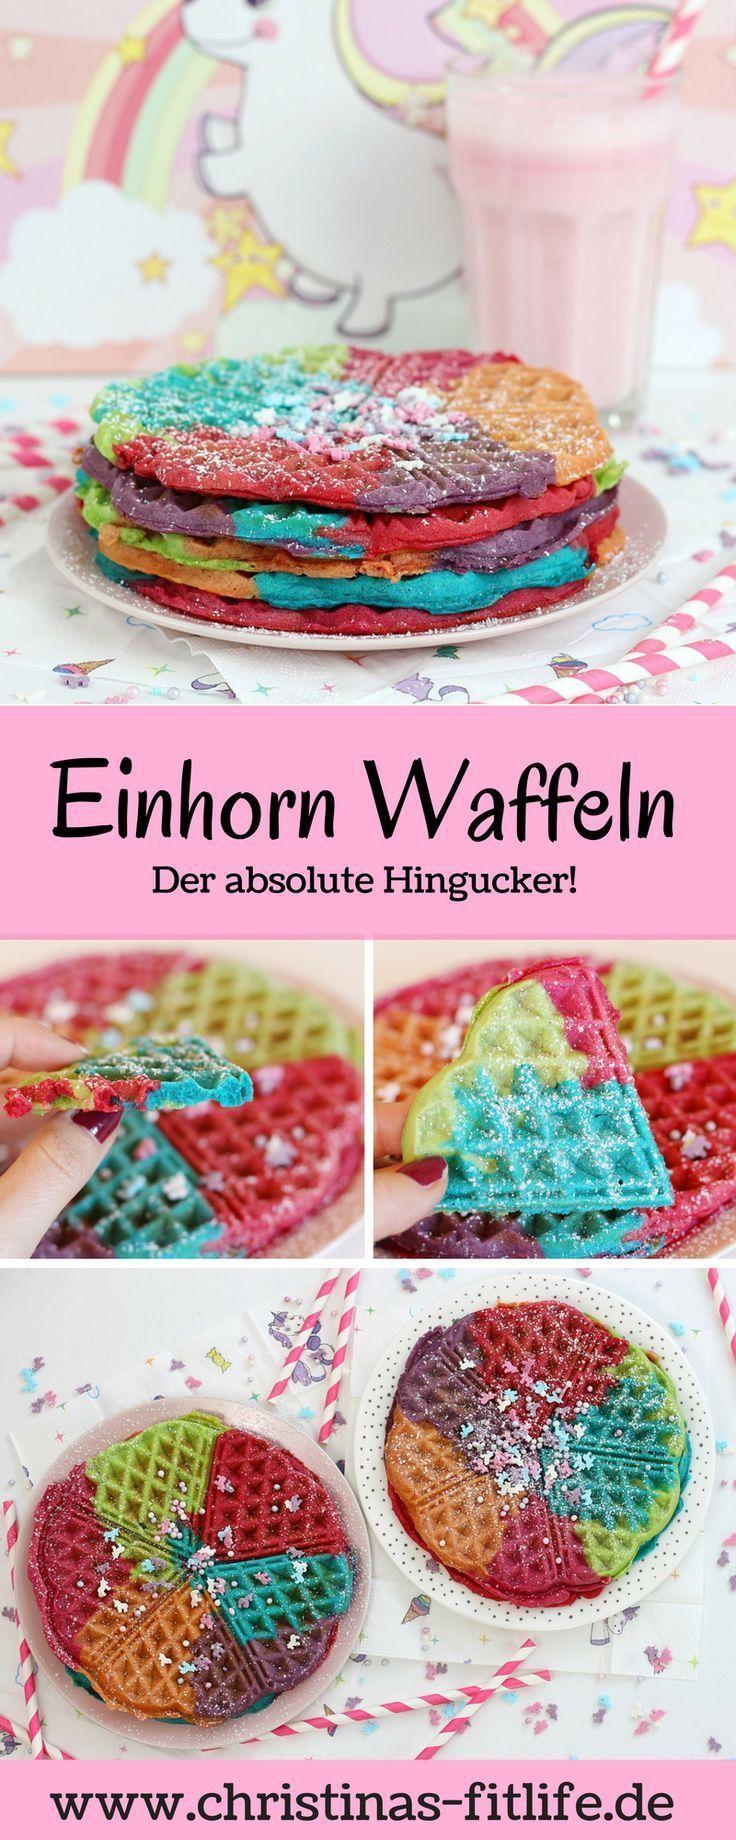 Photo of ᐅ Einhorn Waffeln – der absolute Hingucker! I Rezepte by Christina